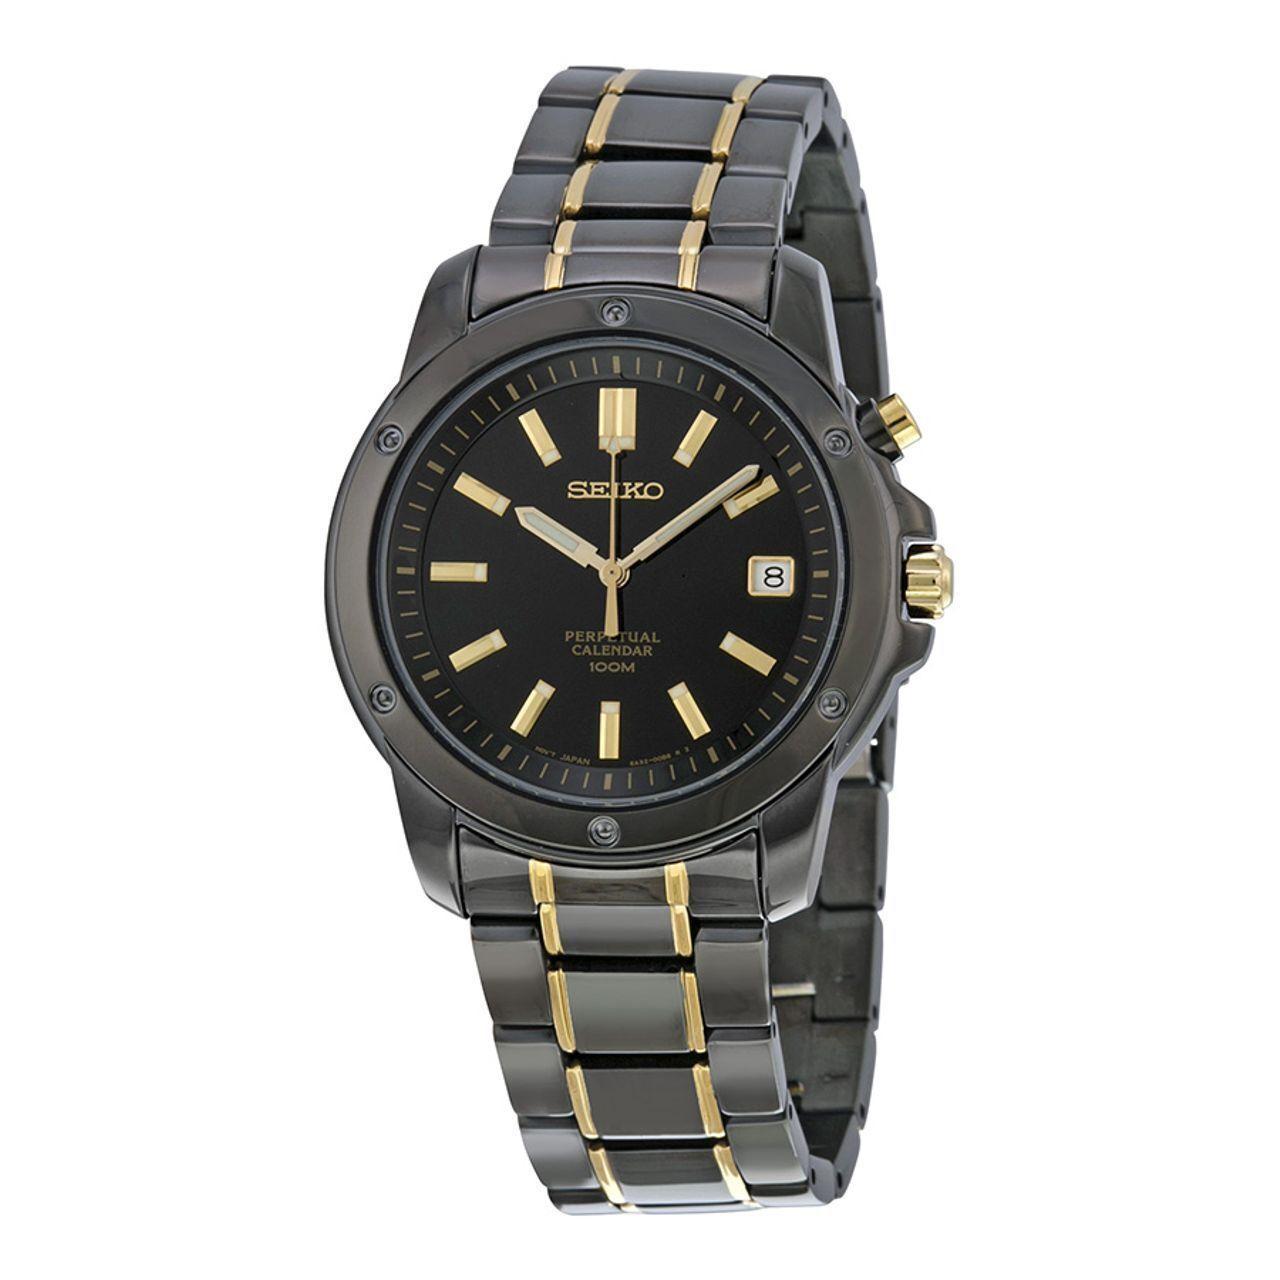 Seiko Perpetual Calendar.Seiko Men S Snq045 Perpetual Calendar 100m Black Tone Luminous Hands Date Watch